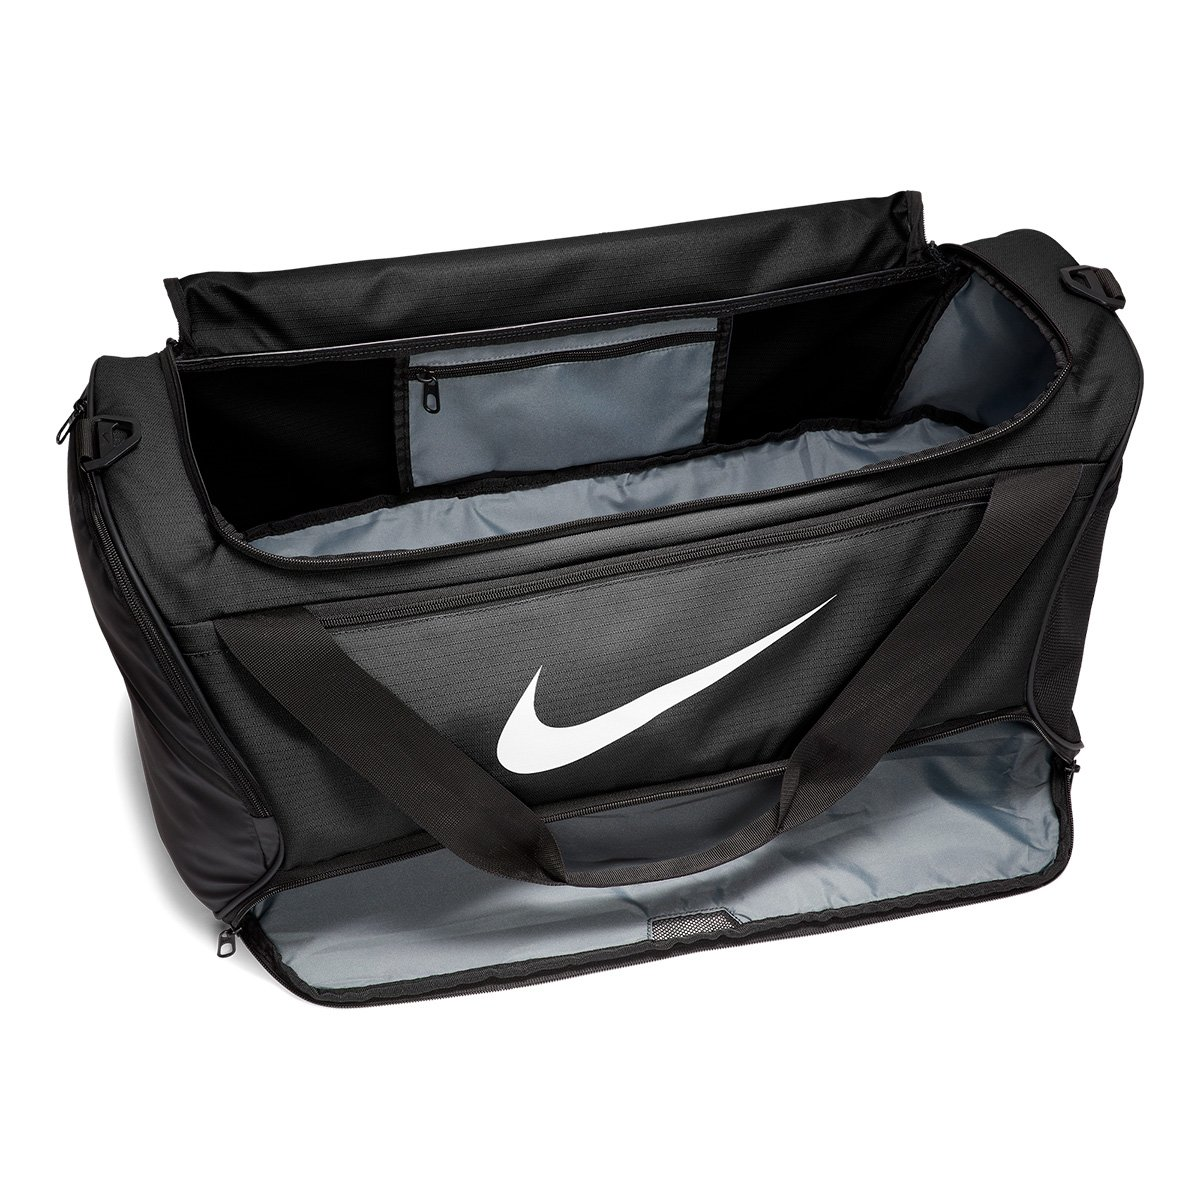 Bolsa Nike 60 Litros Média - Preta